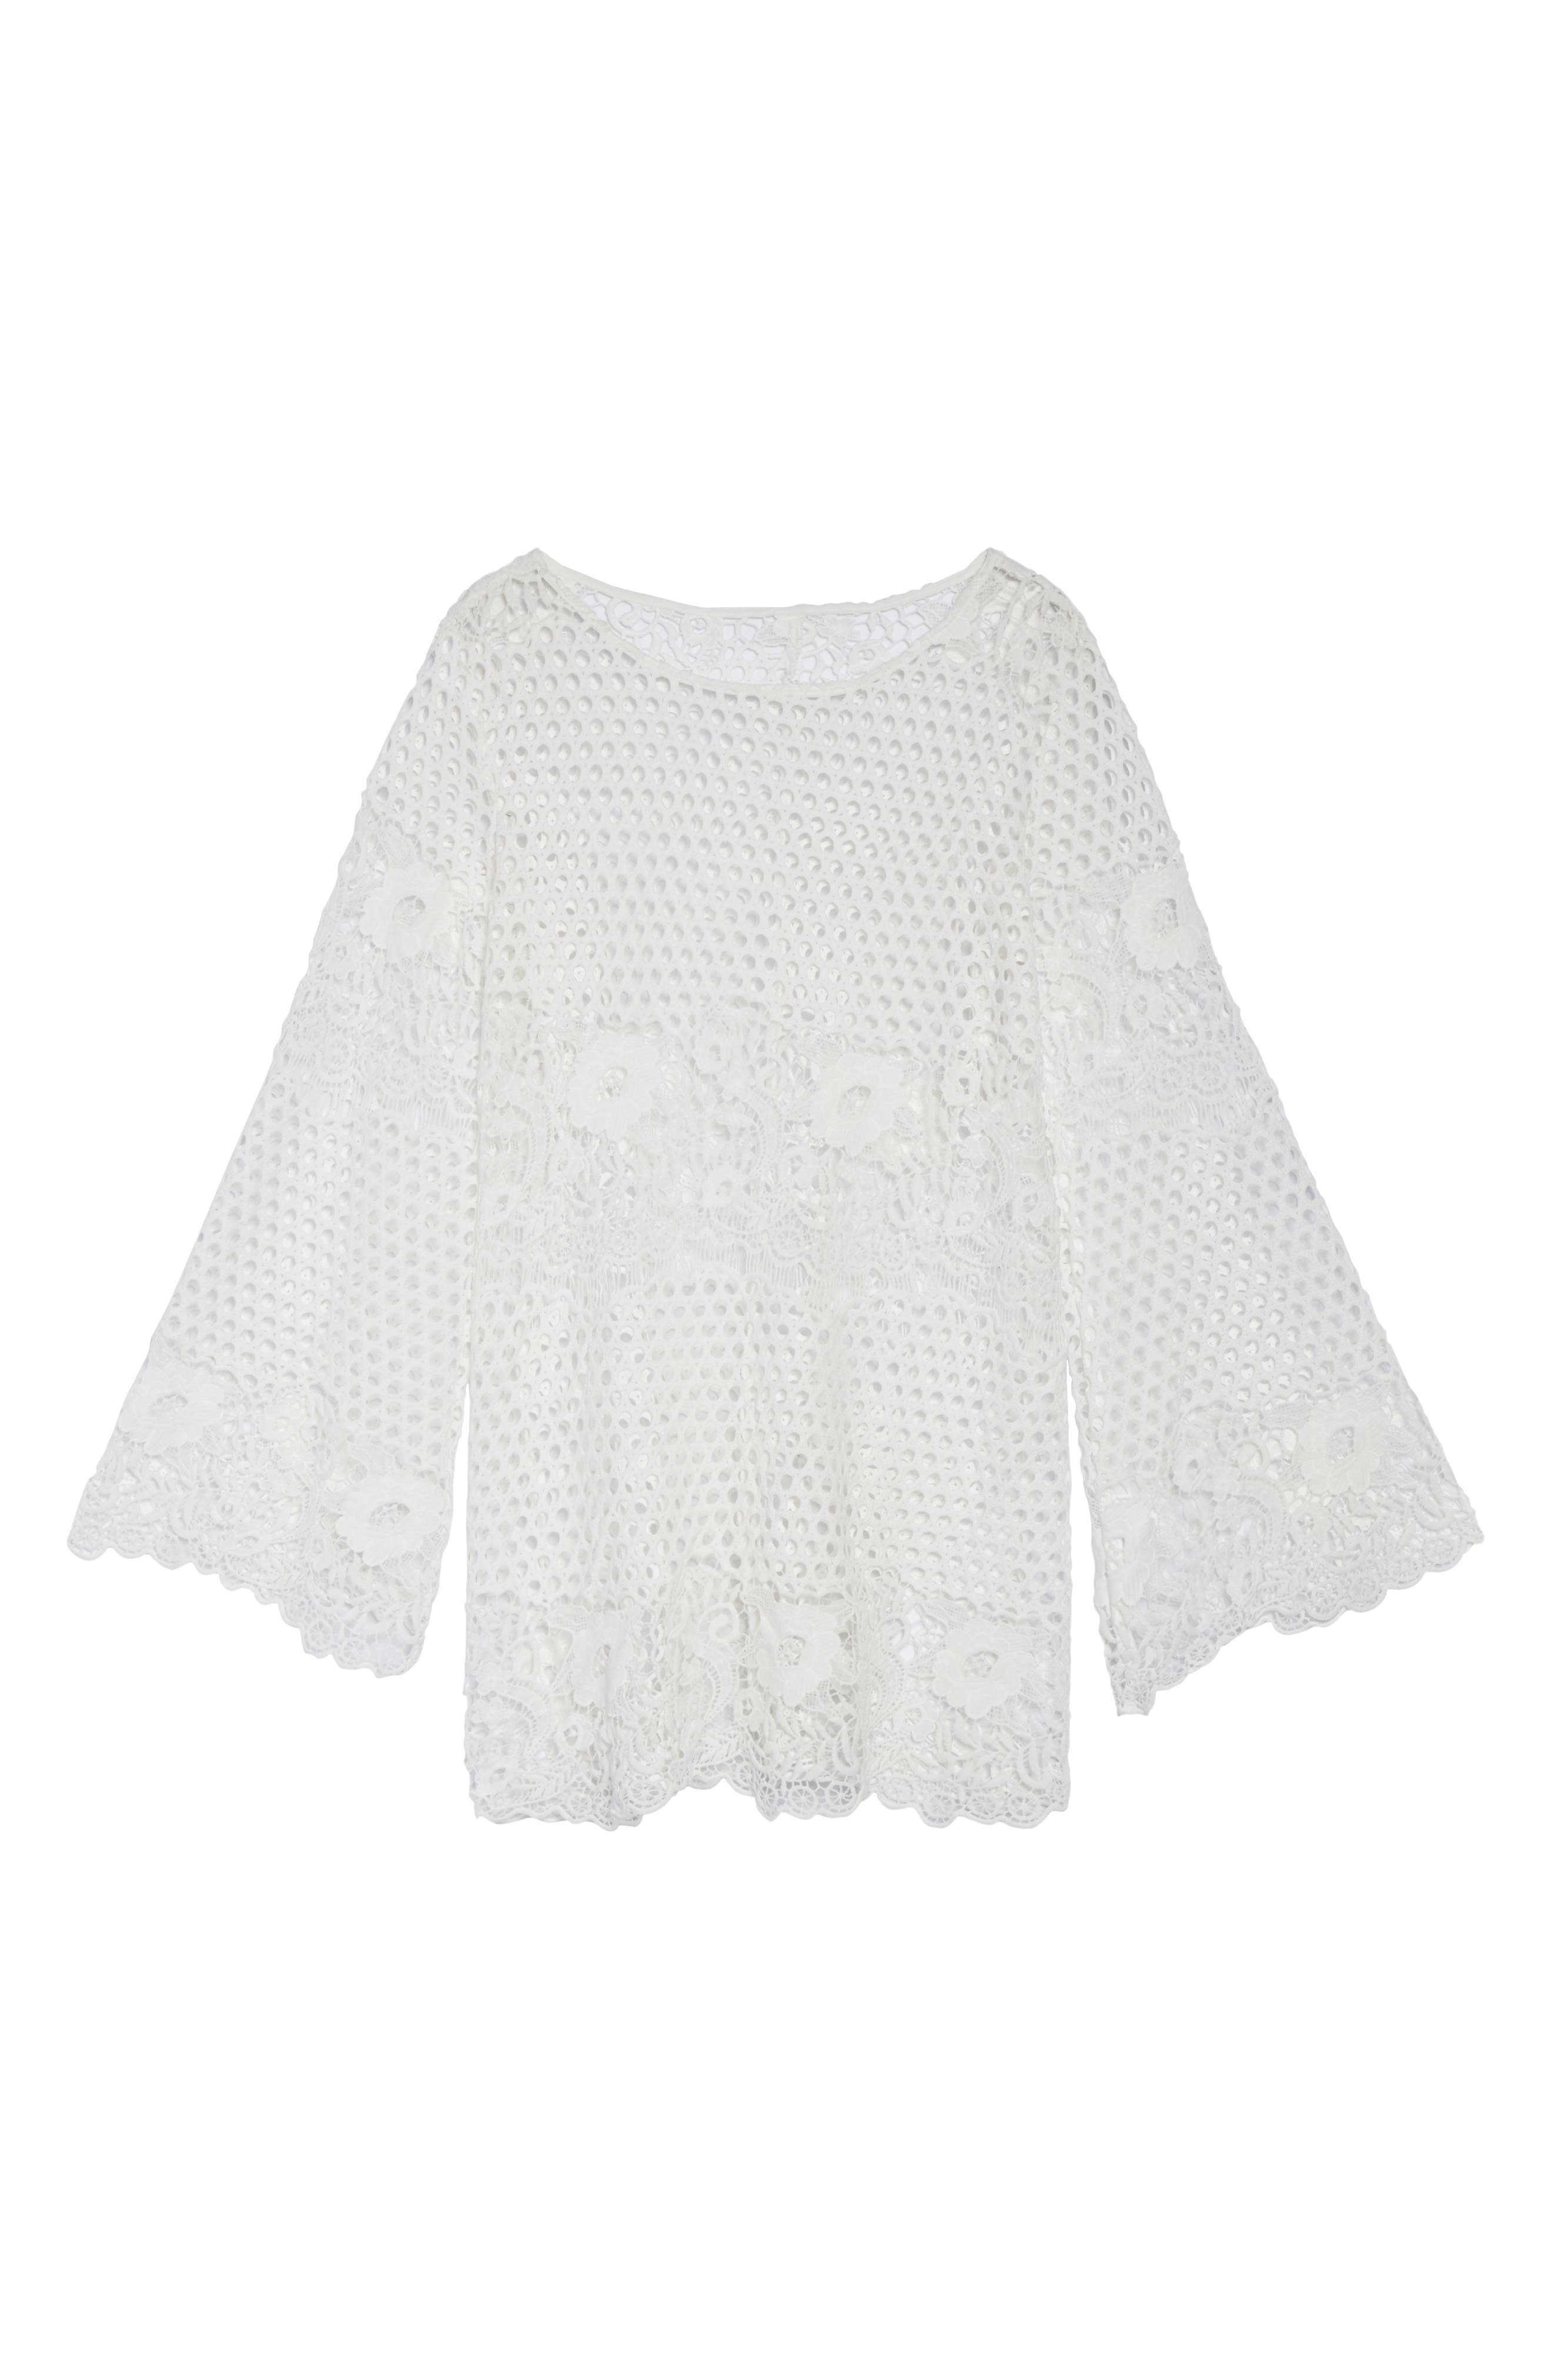 Crochet Cover-Up,                             Alternate thumbnail 6, color,                             100